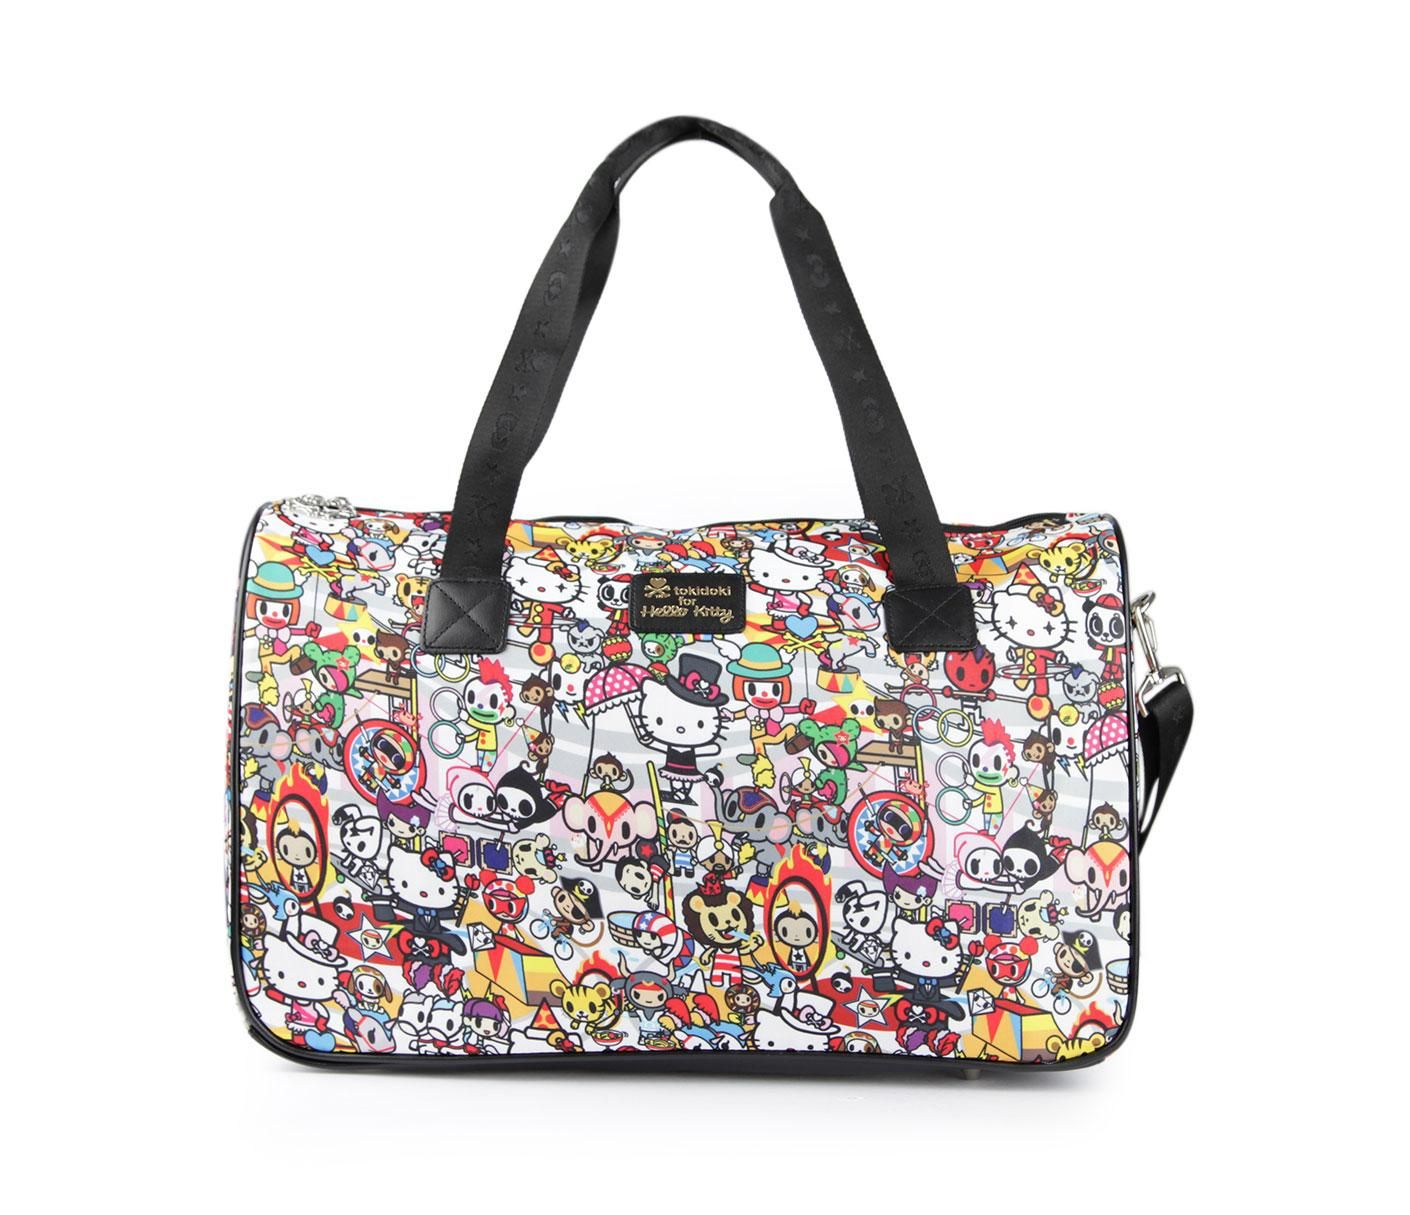 tokidoki x Hello Kitty Overnight Bag  Circus Collection  a2e1bb6428366